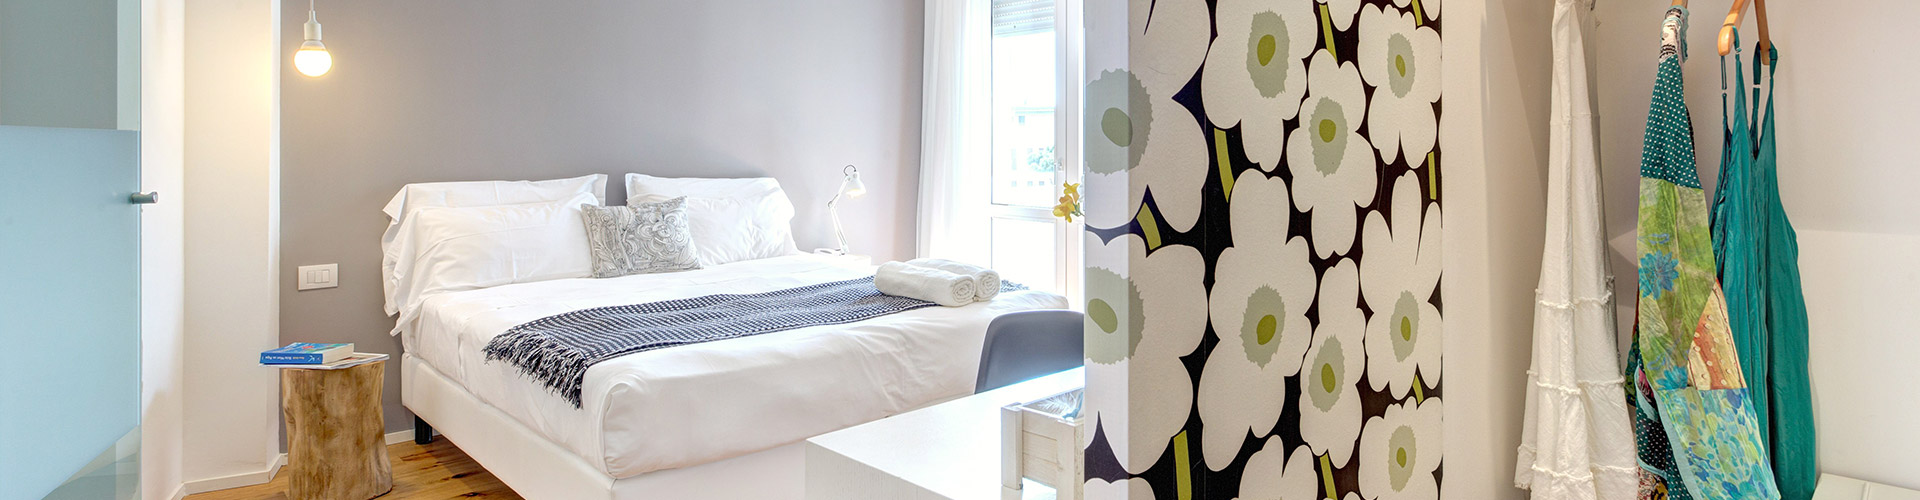 hotel_solemare